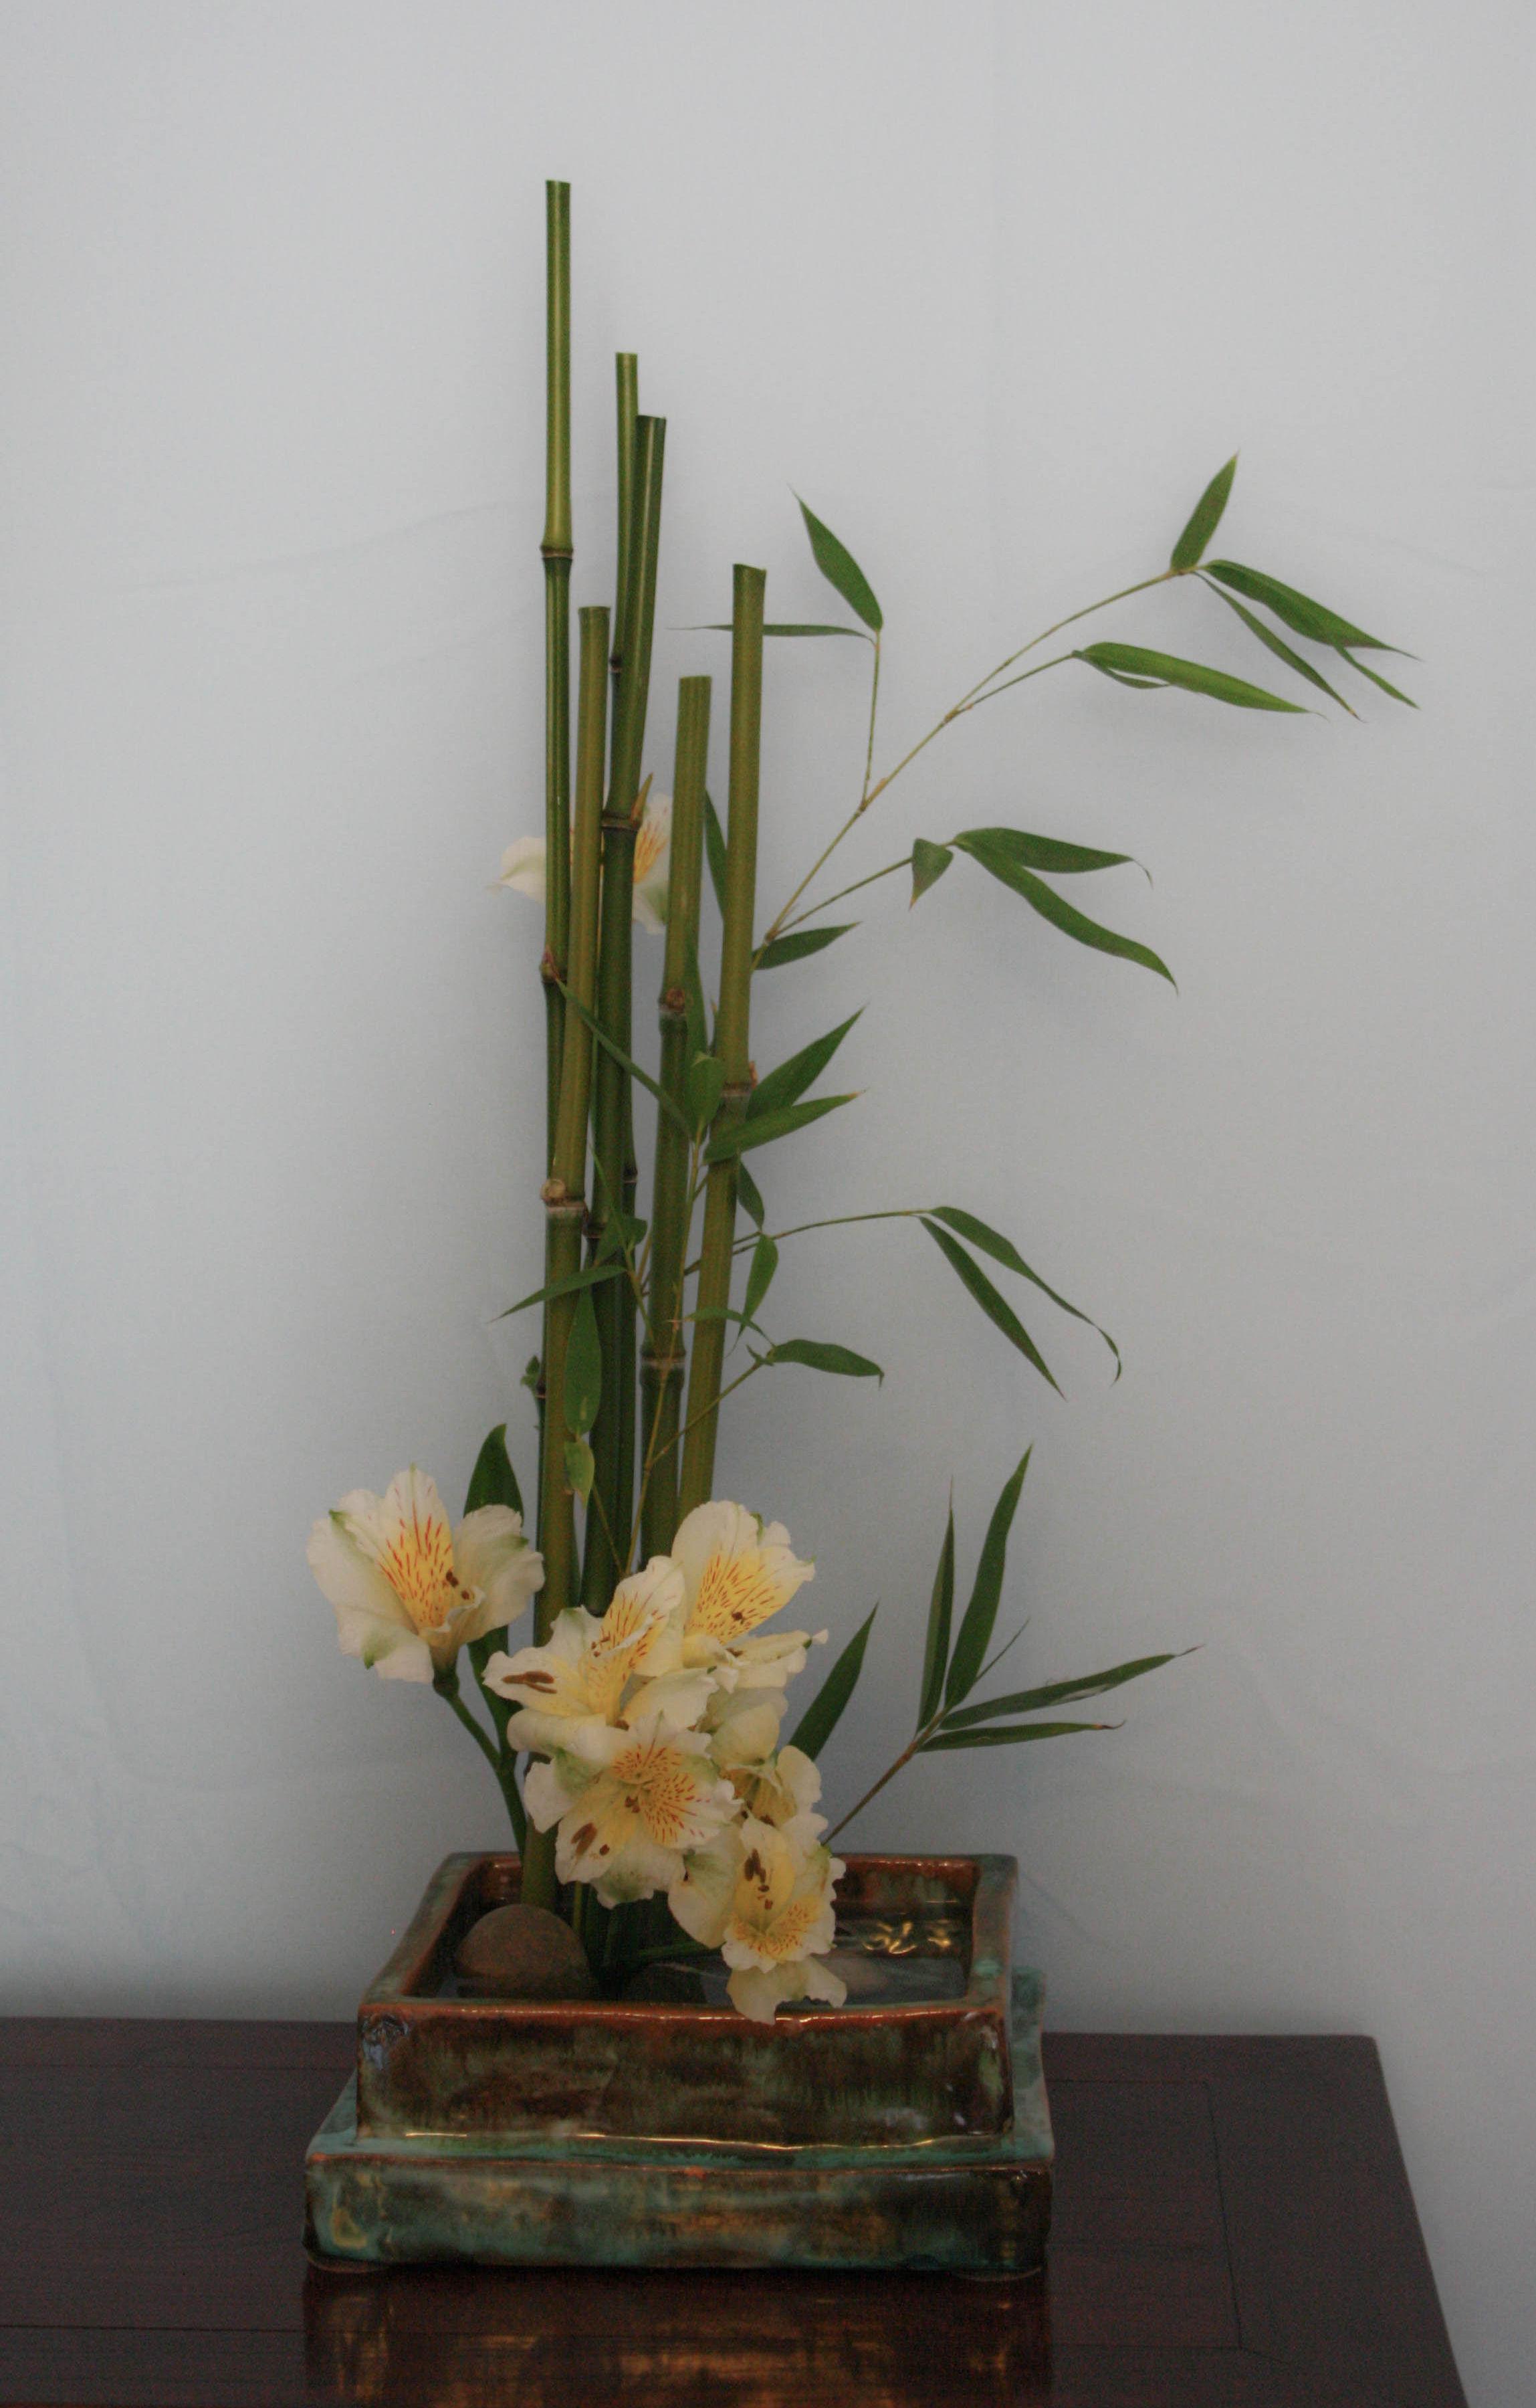 Show luca ramacciotti sogetsu concentus study group for Canne di bamboo da arredo